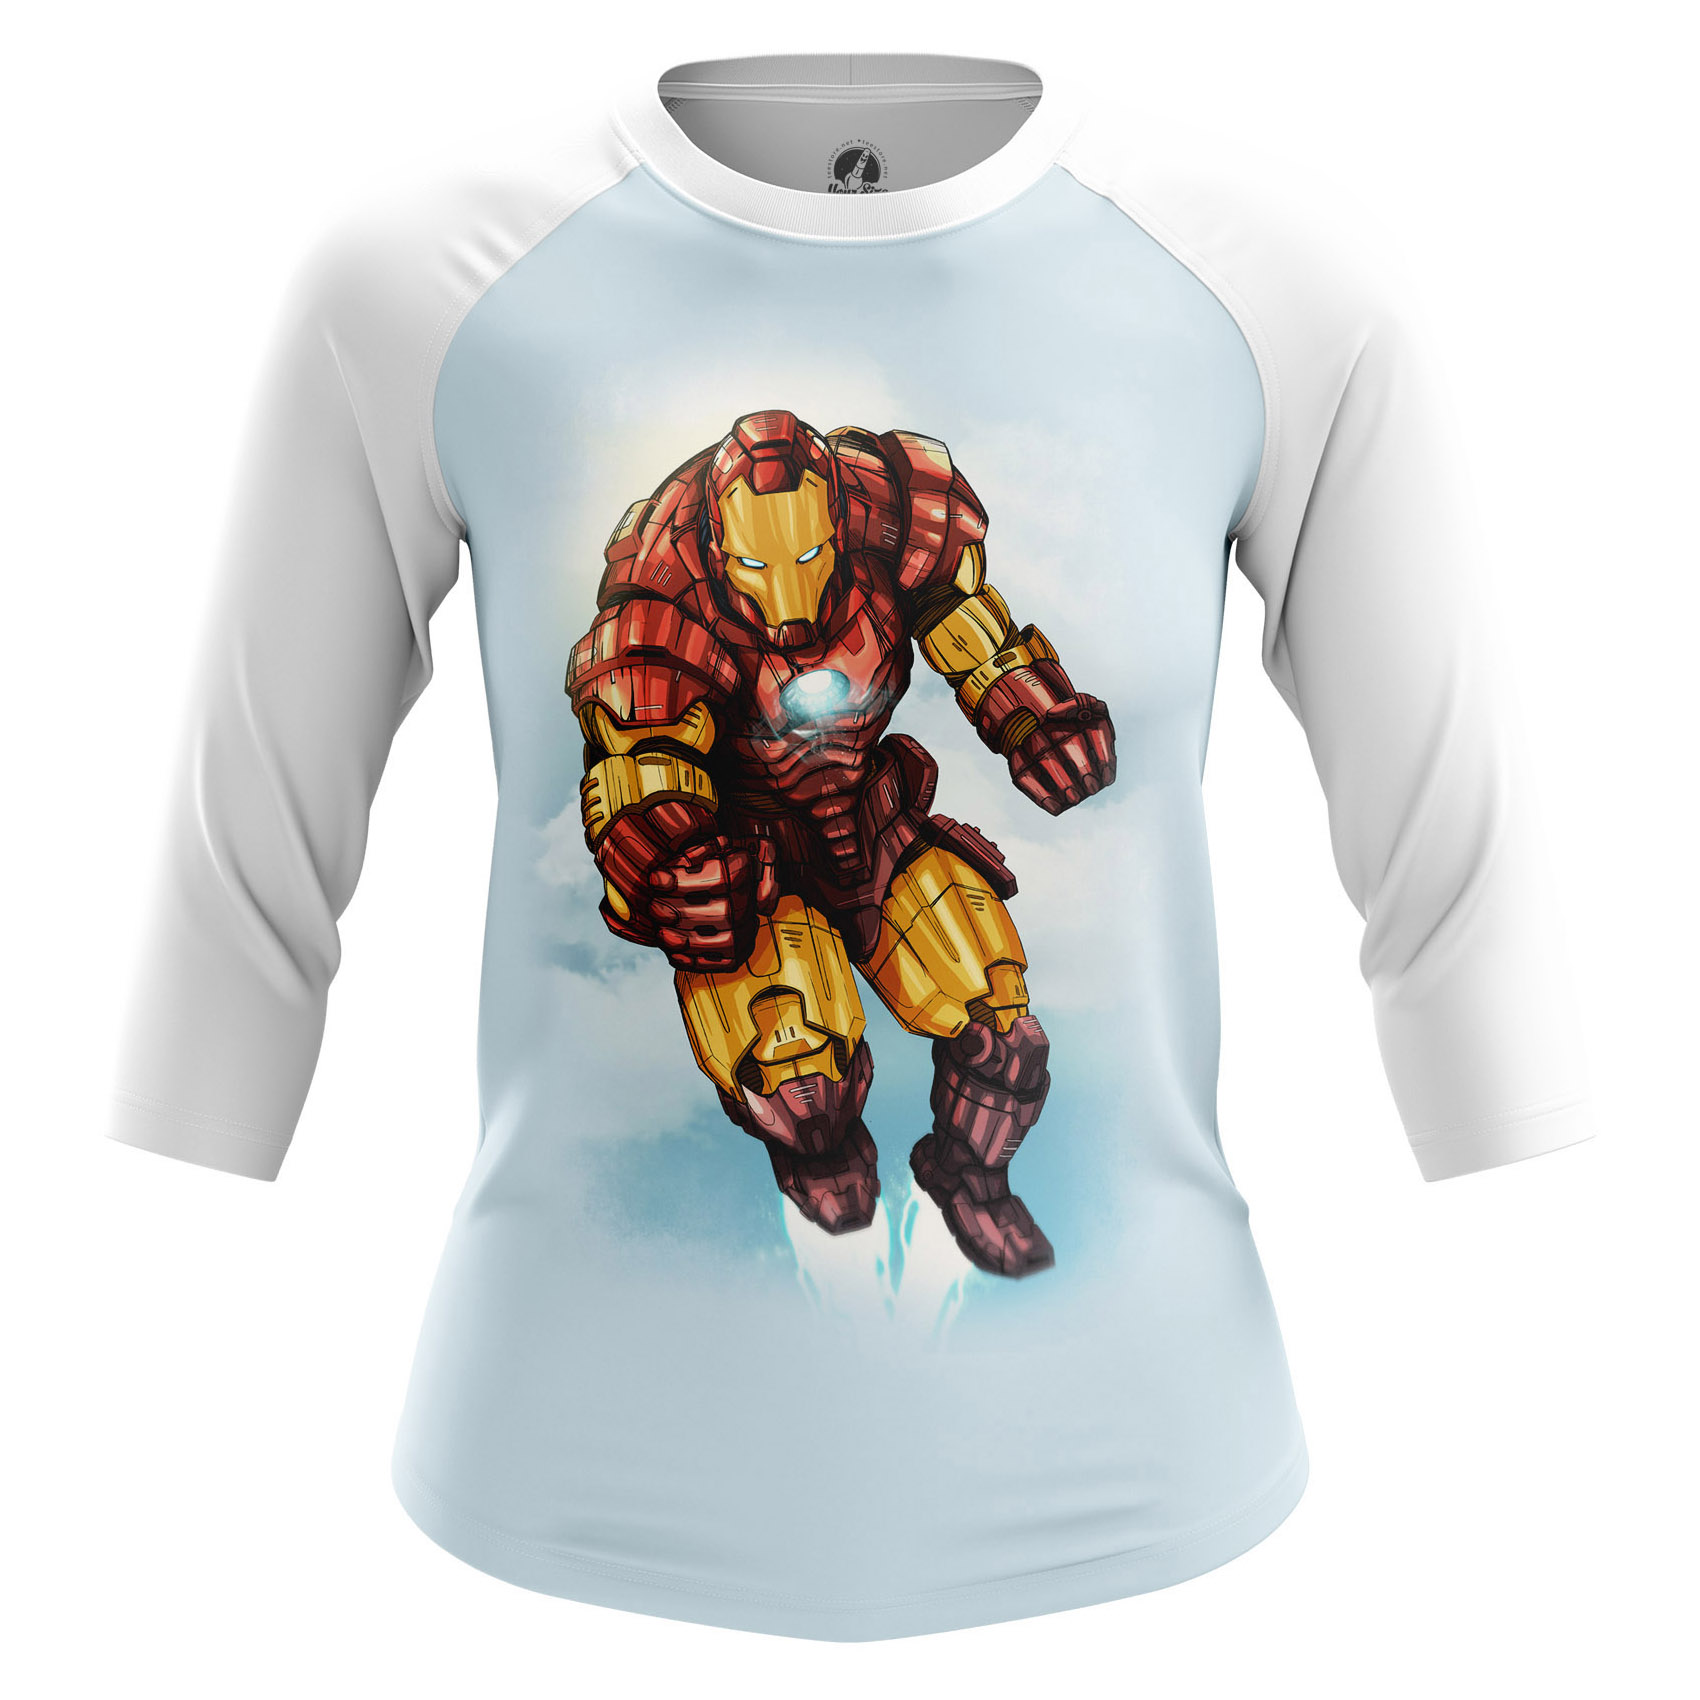 Collectibles Women'S Long Sleeve Man Of Iron Tony Stark Iron Man